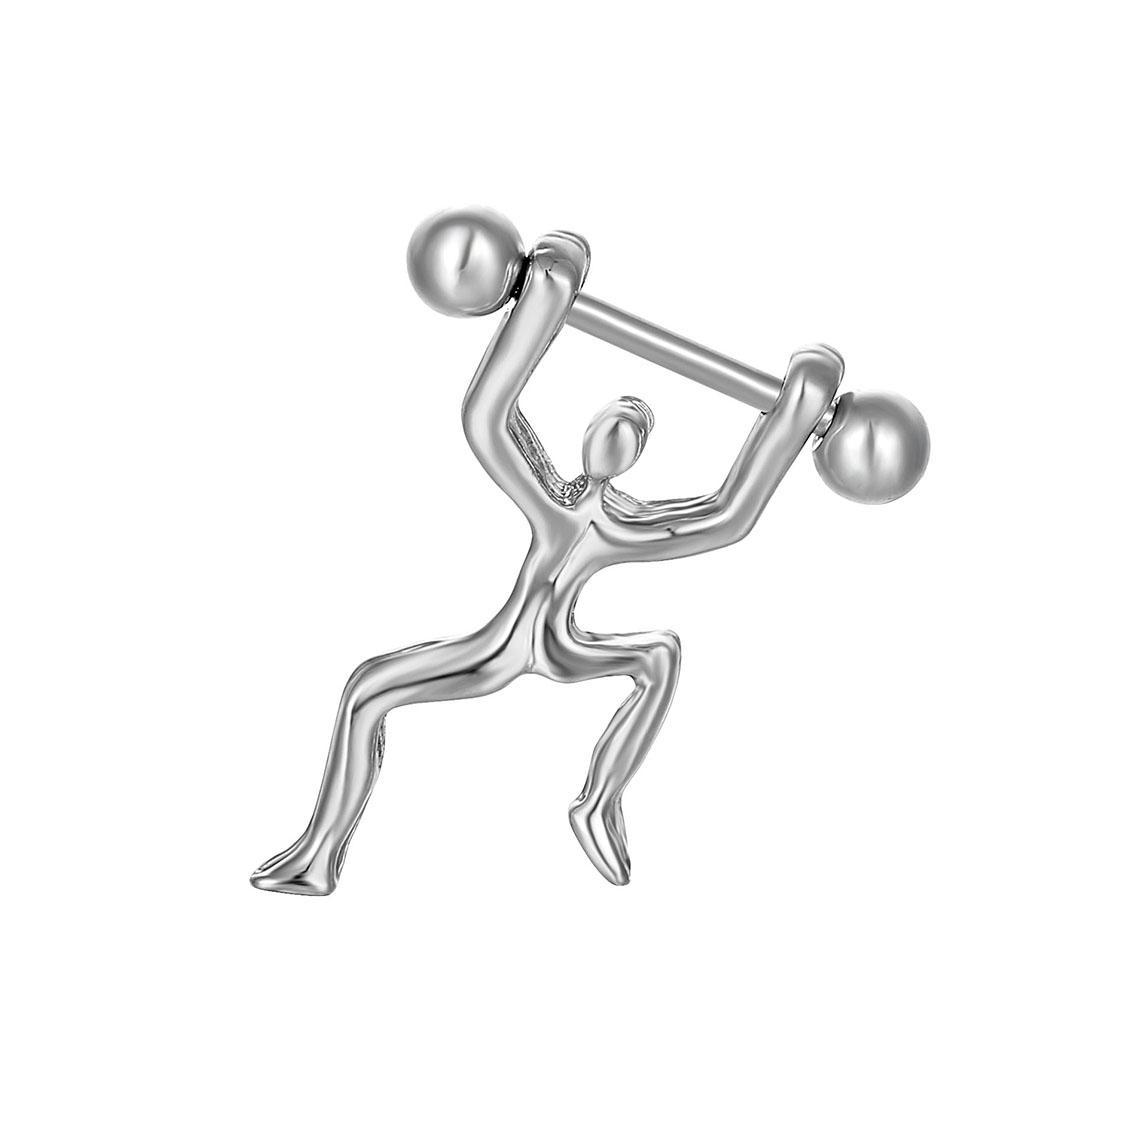 D0167(1色)人スタイルニップルリングベリーボタンボディピアスジュエリーダングルアクセサリーファッションチャーム(10pcs /ロット)JFB-6160